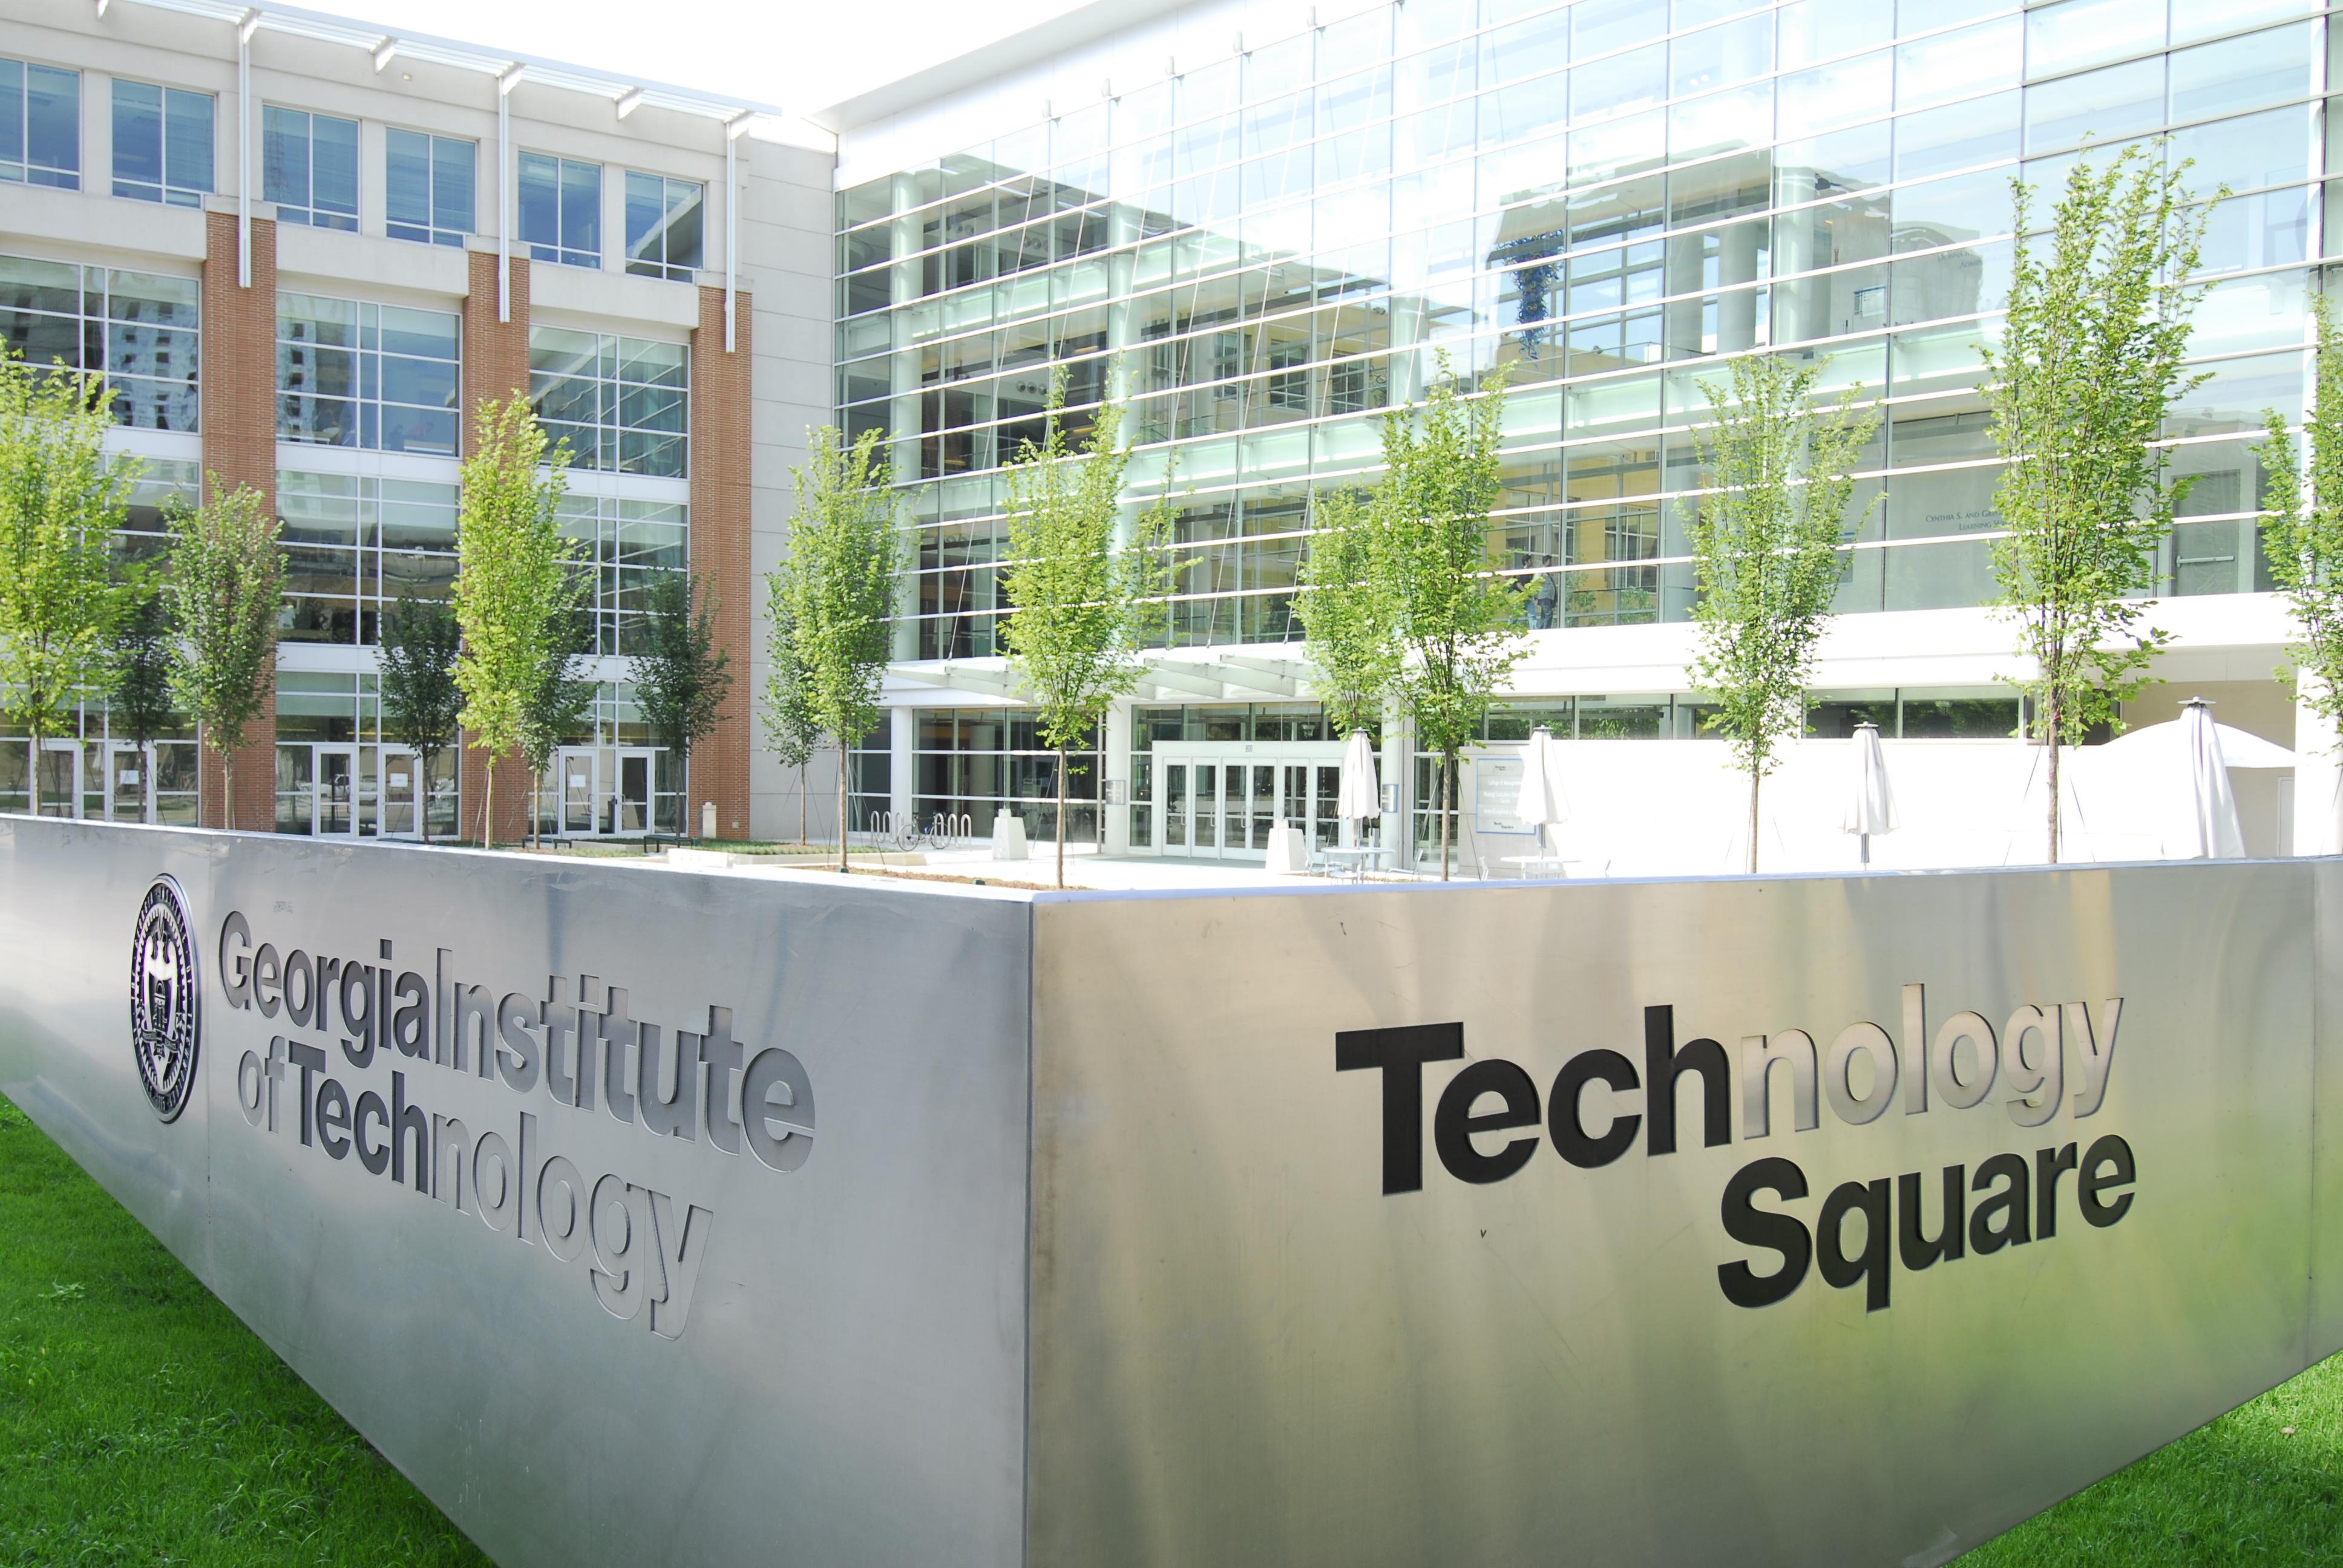 Tech Square at Georgia Tech.